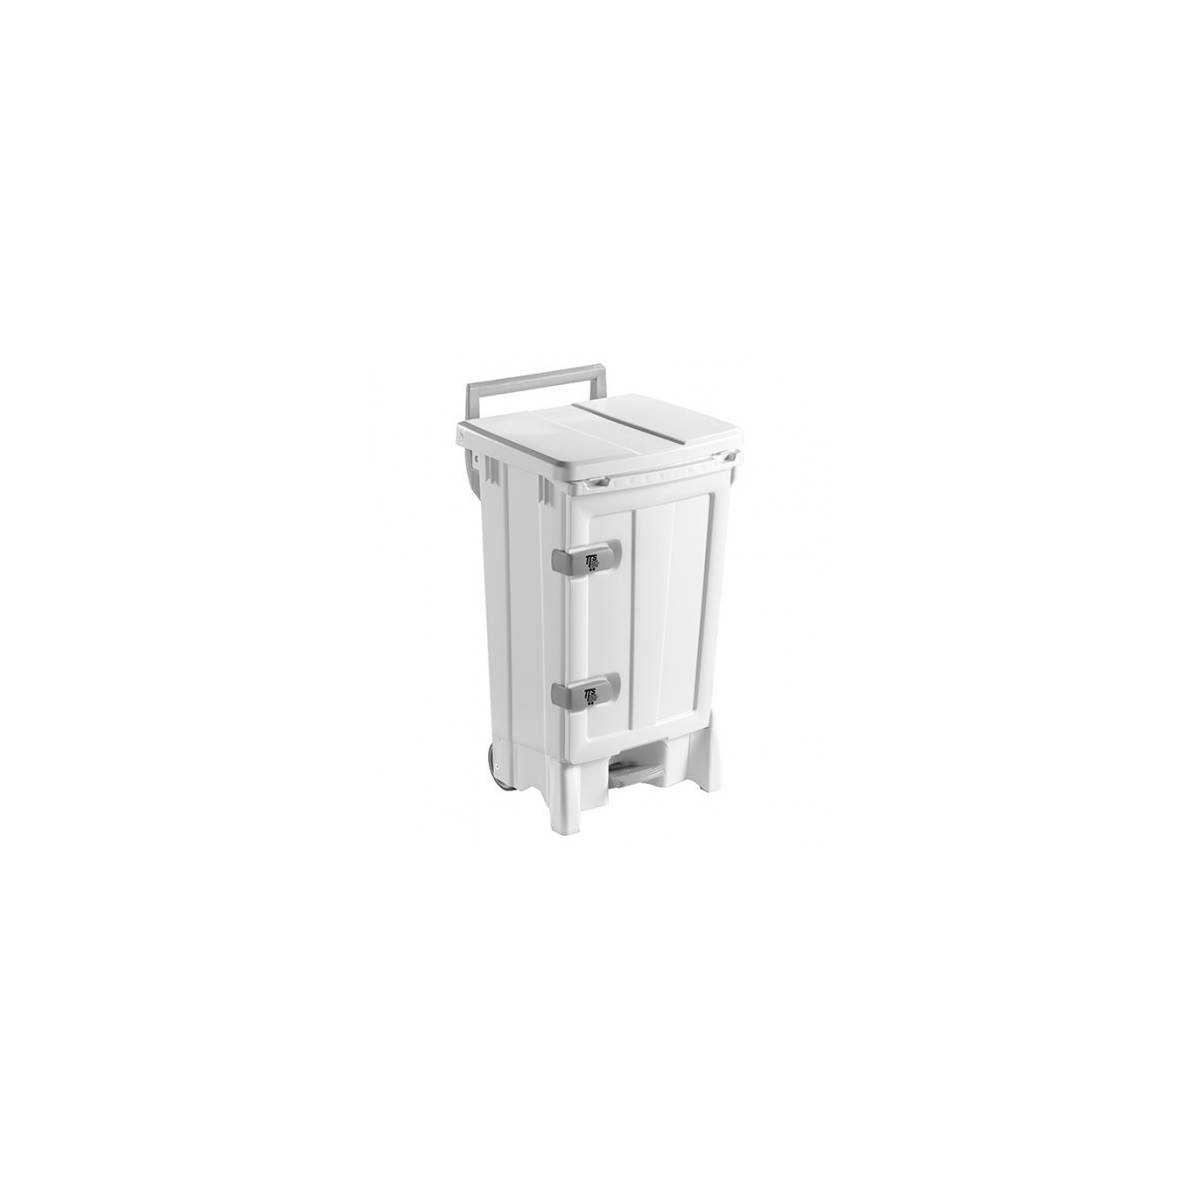 Контейнер для мусора 90л OPEN-UP (5700) 5700 TTS